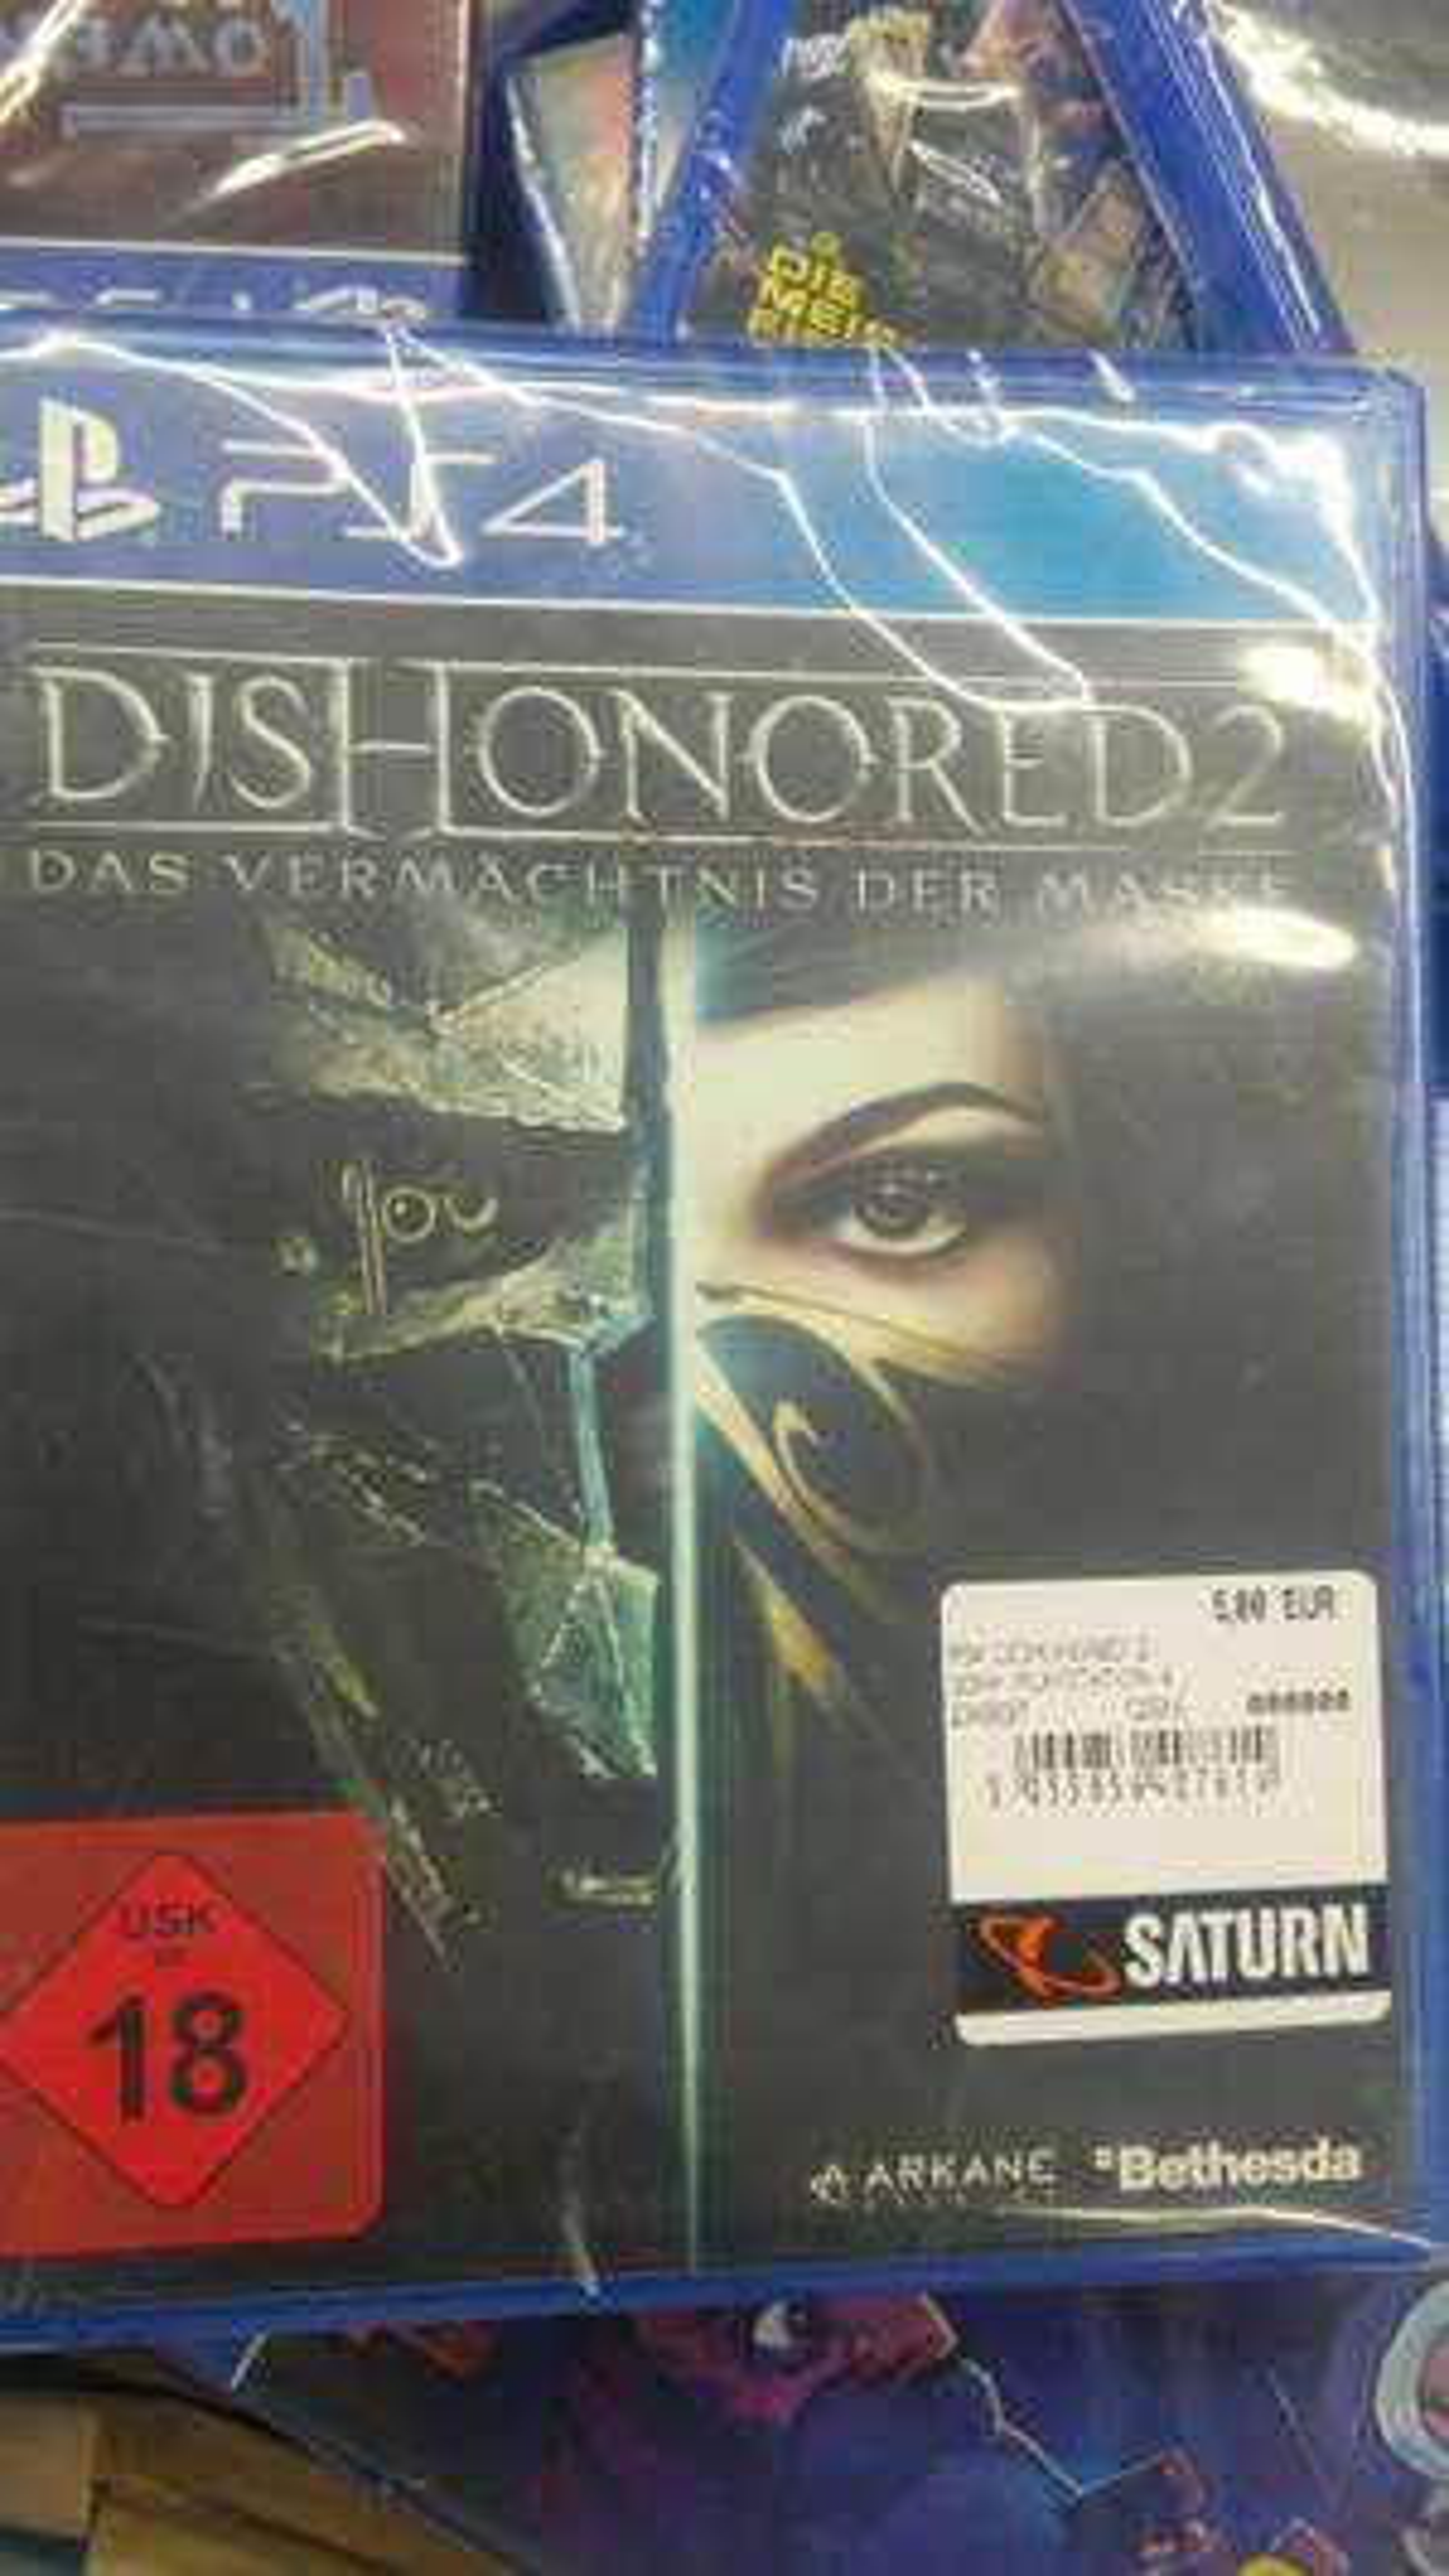 [Lokal Saturn Duisburg] Dishonored 2: Das Vermächtnis der Maske